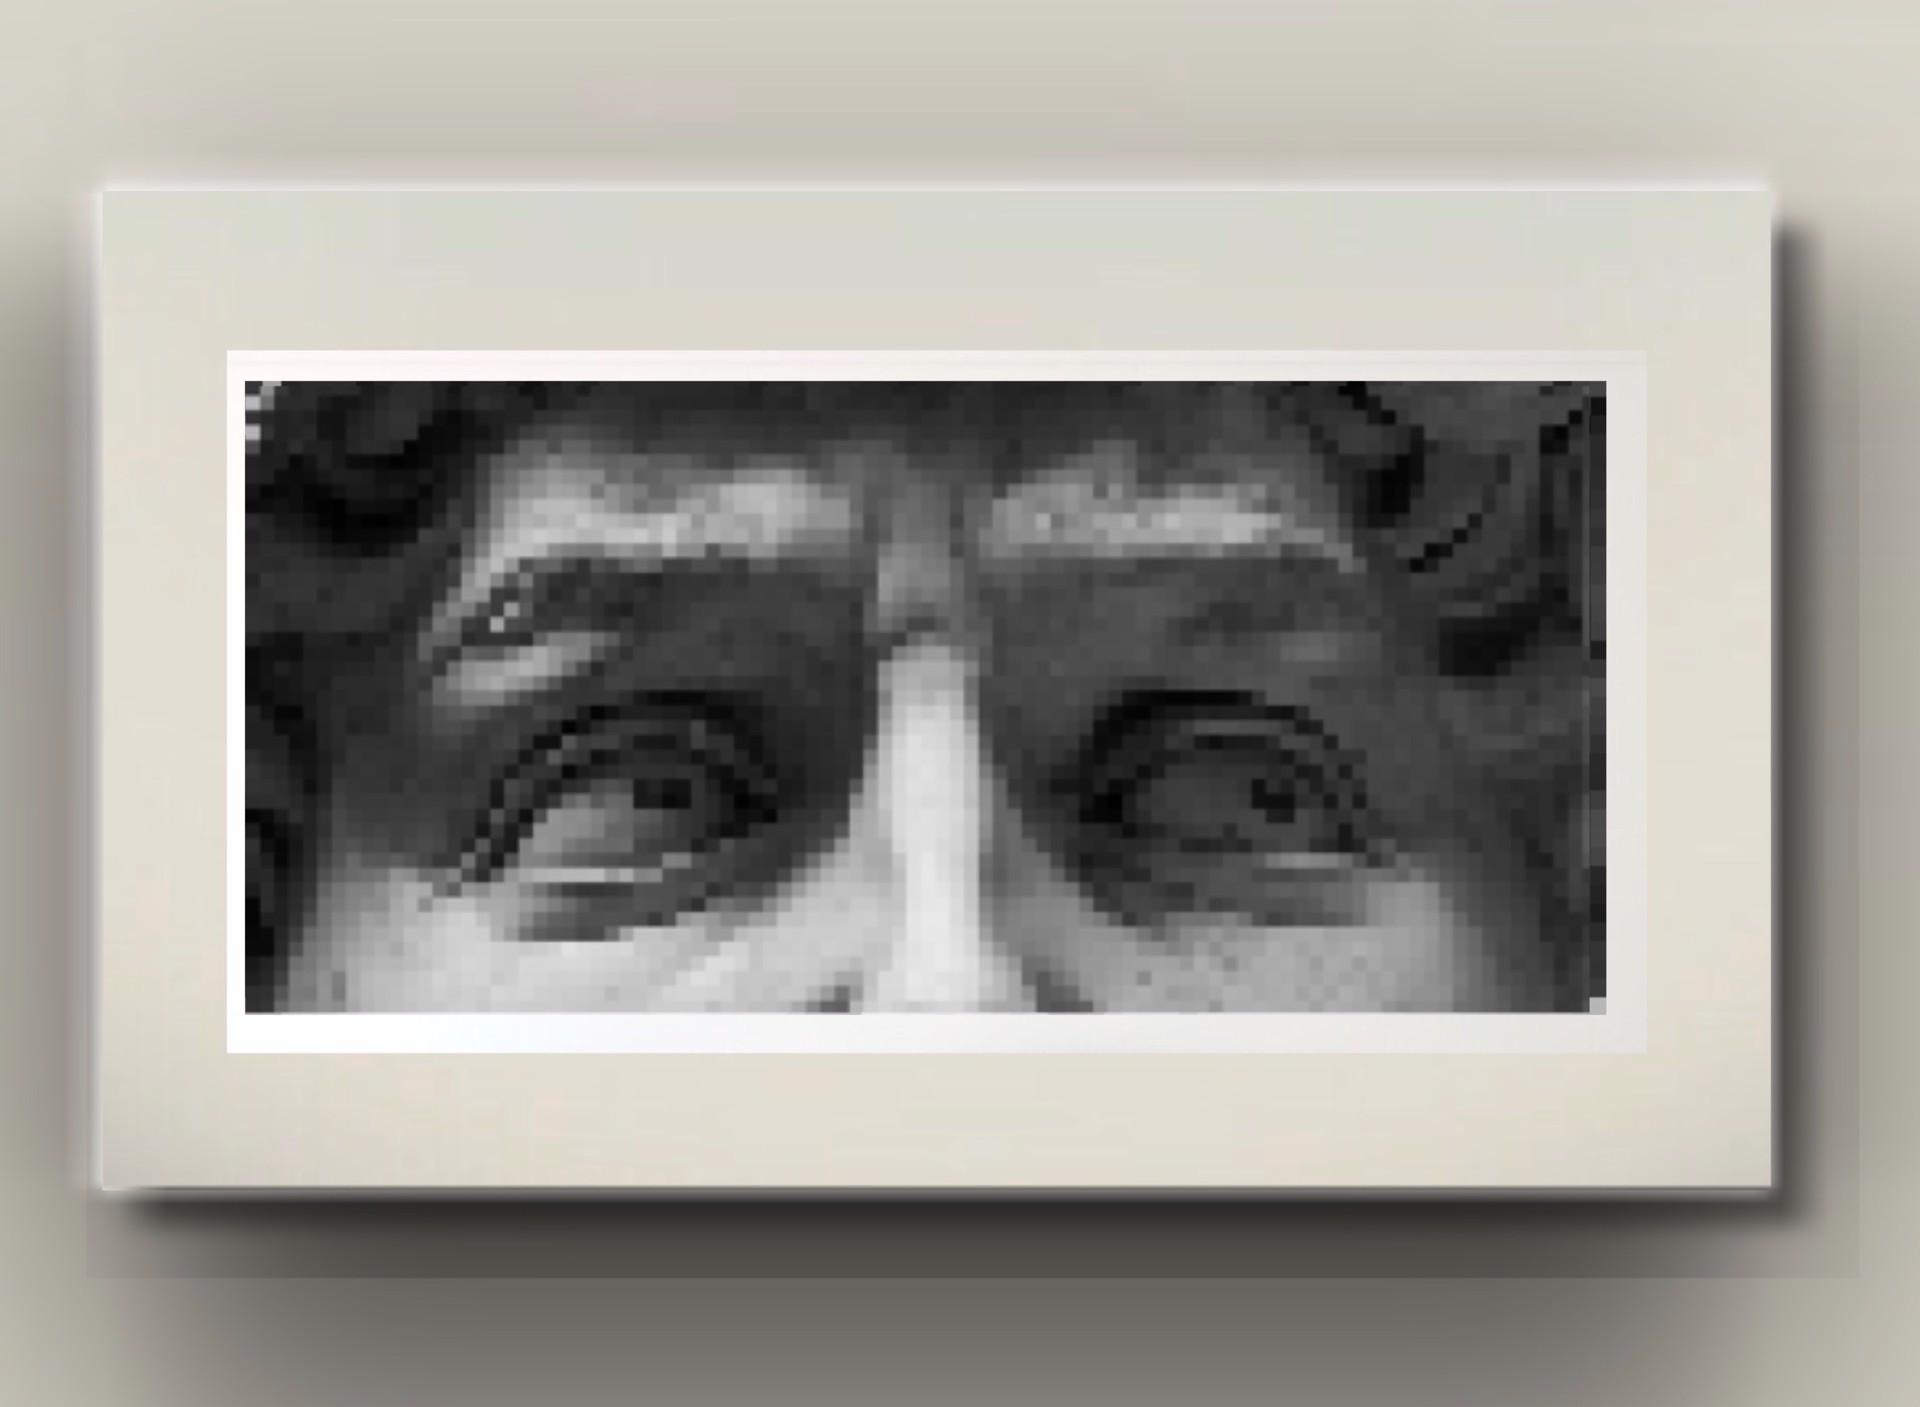 David II by J.P. Goncalves, Pixel